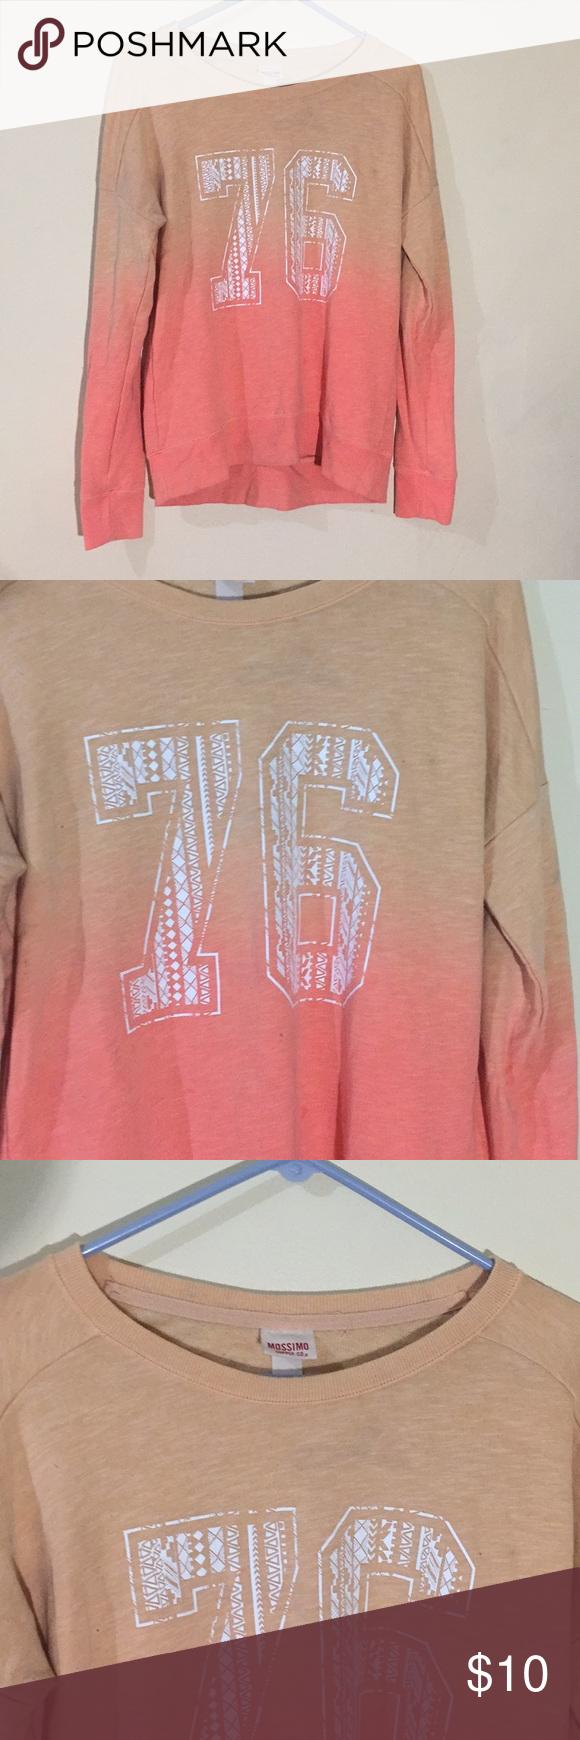 Peach Ombre Jersey Style Crewneck Sweatshirt Crew Neck Sweatshirt Sweatshirts Style [ 1740 x 580 Pixel ]